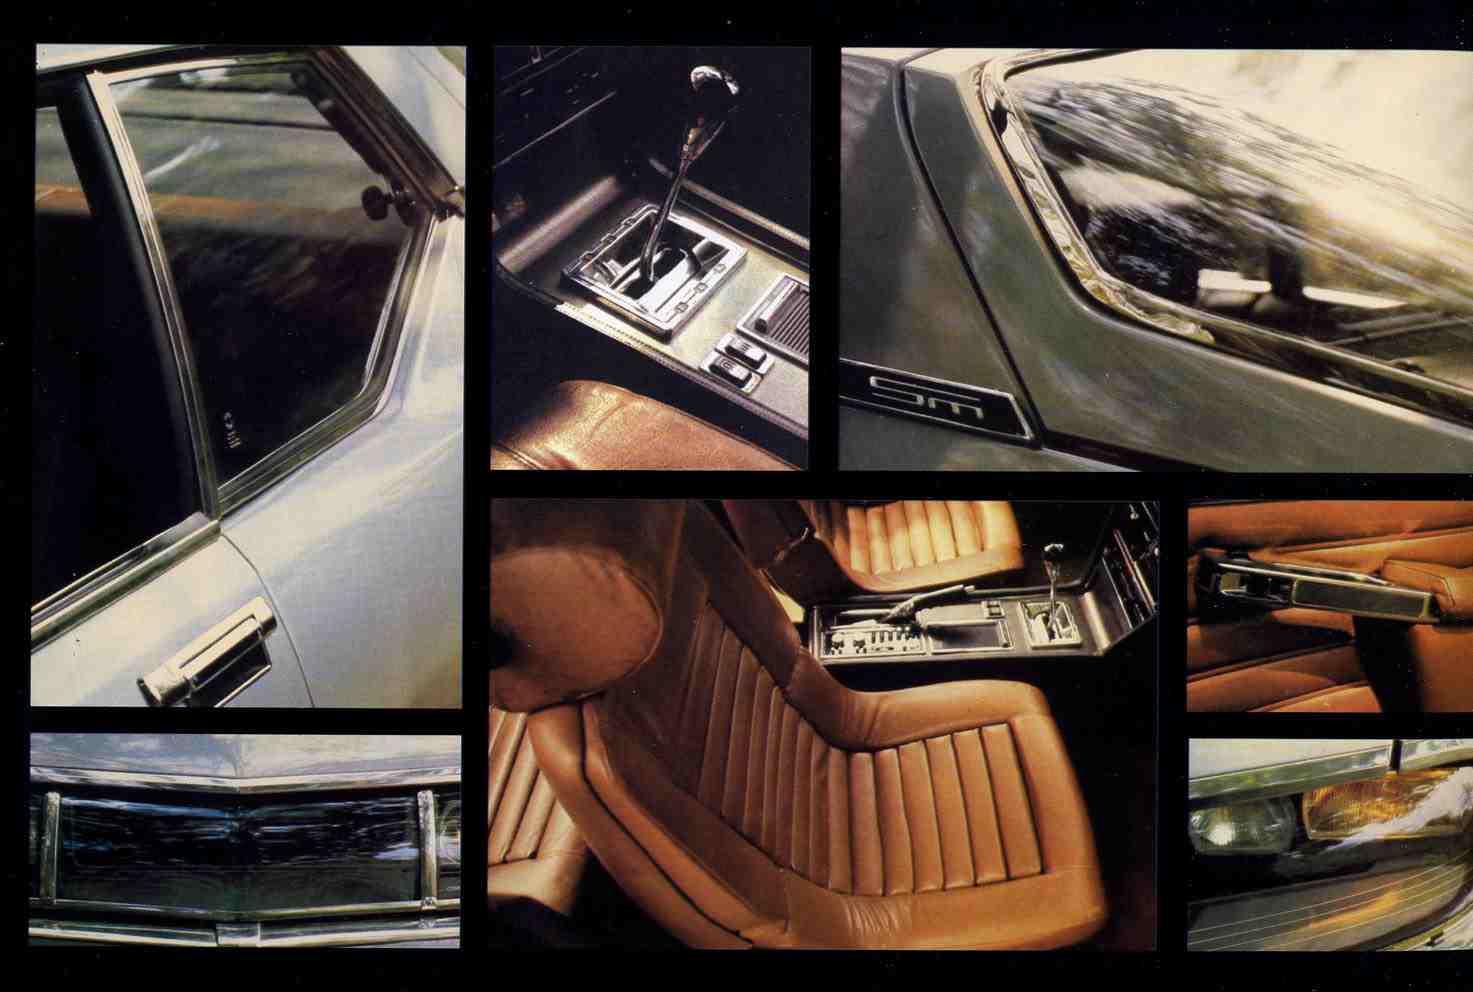 Citroen SM - Relive the Glamorous 1970s - autoevolution